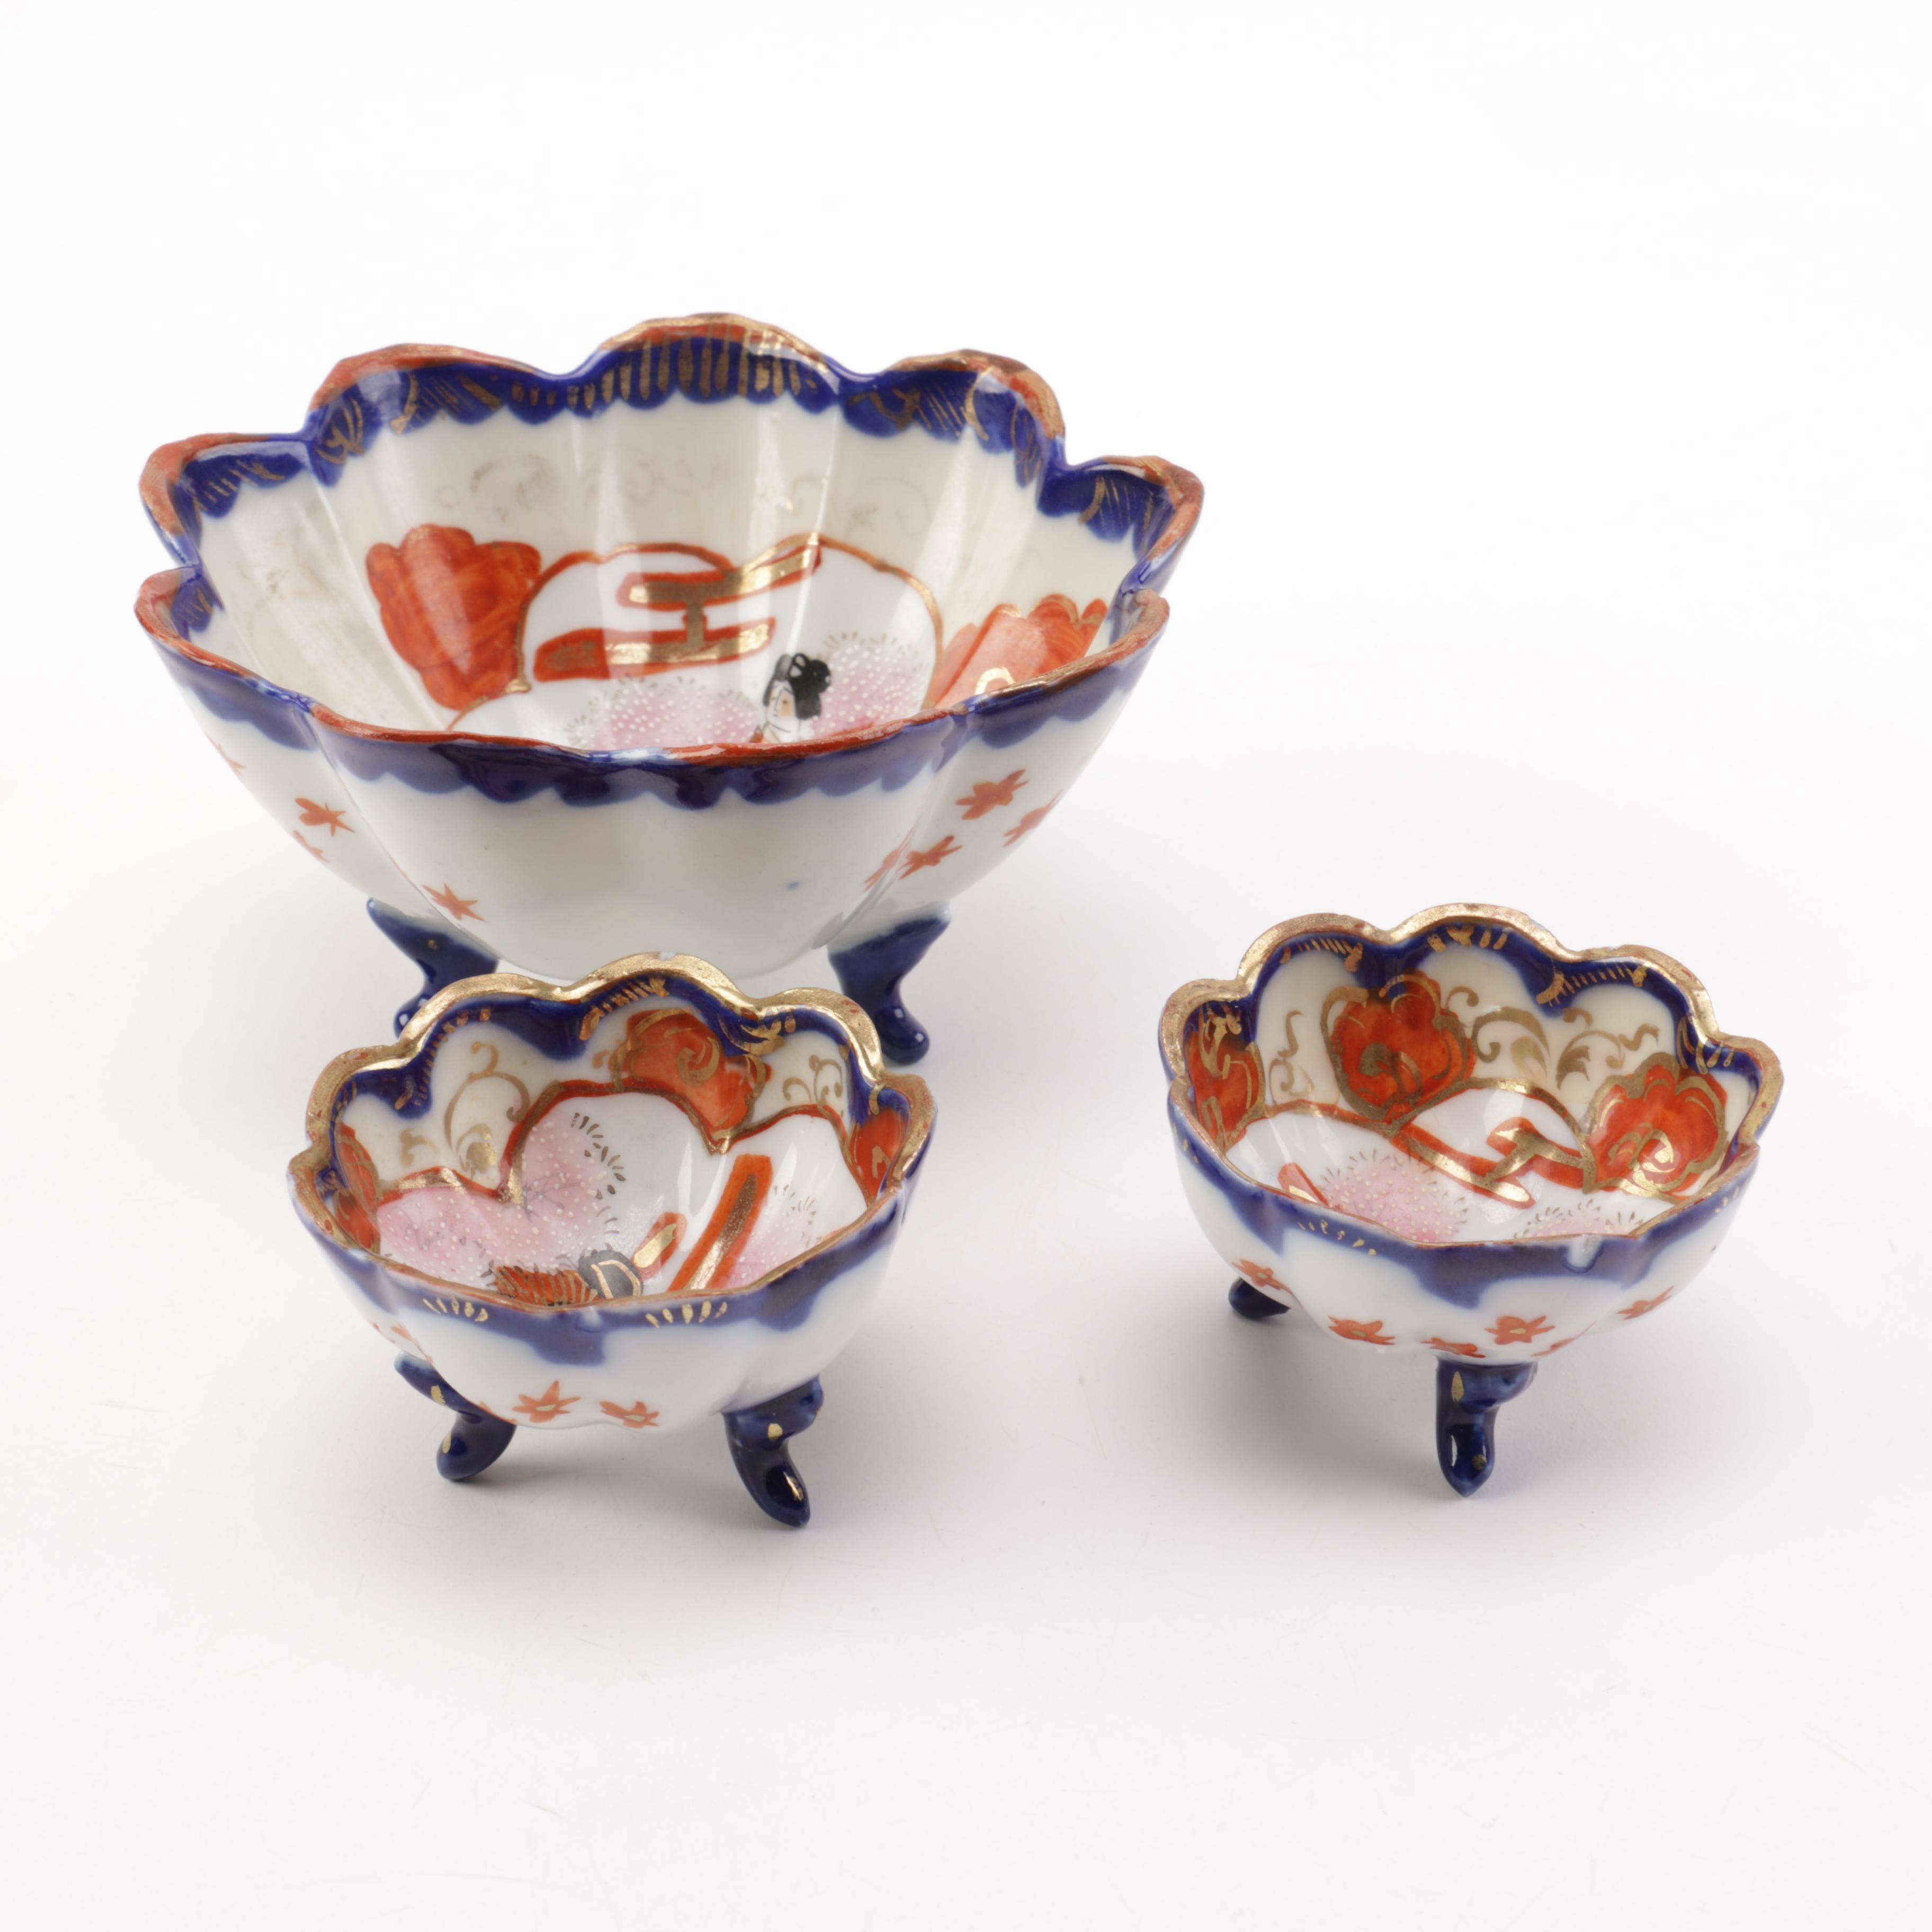 Vintage Japanese Geisha Porcelain Bowls